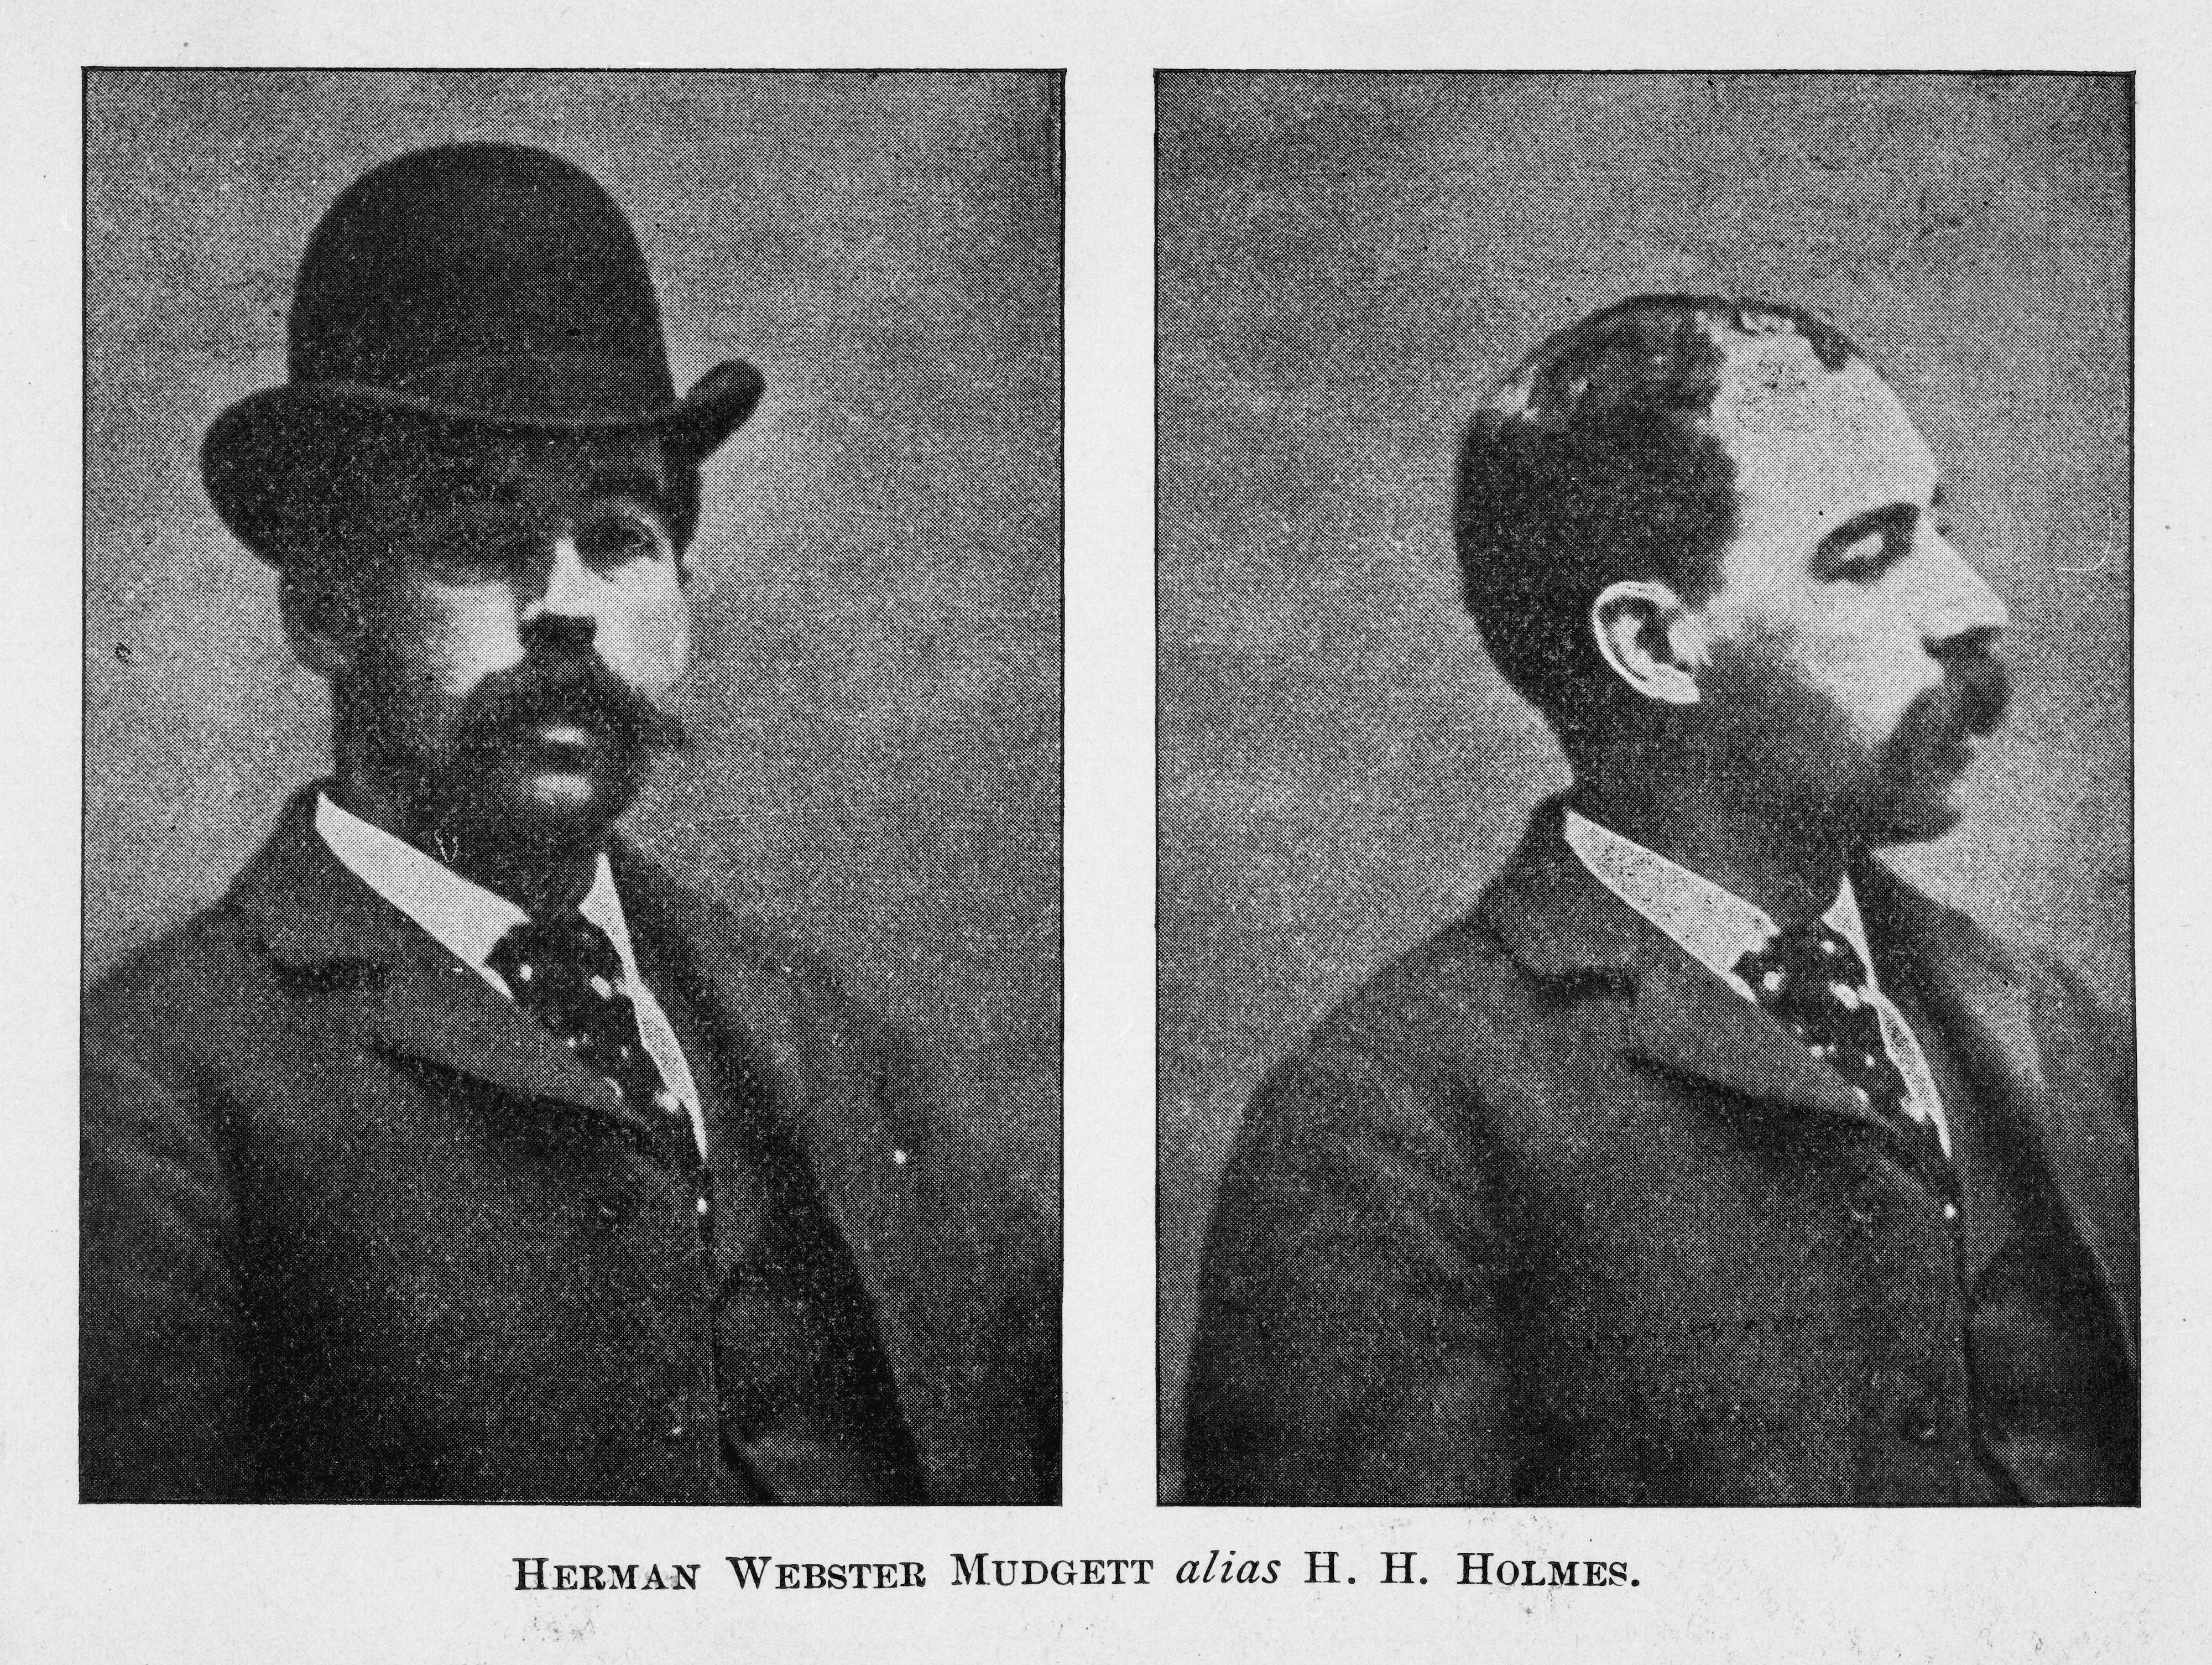 H.H. Holmes Biography